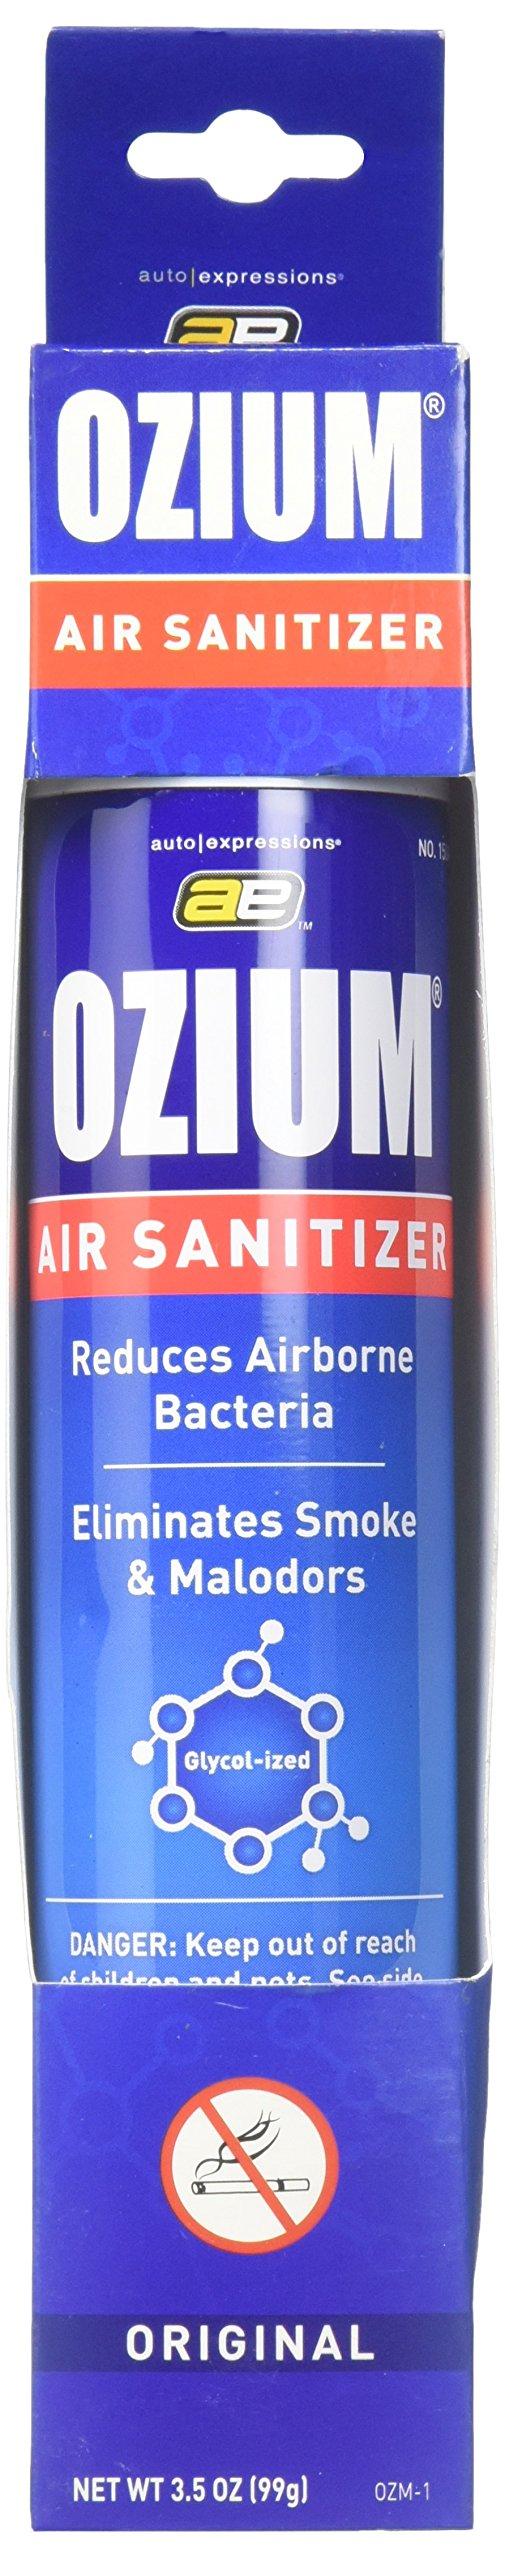 Ozium Glycol-Ized Professional Air Sanitizer / Freshener Original Scent, 3.5 oz. aerosol (OZM-1)